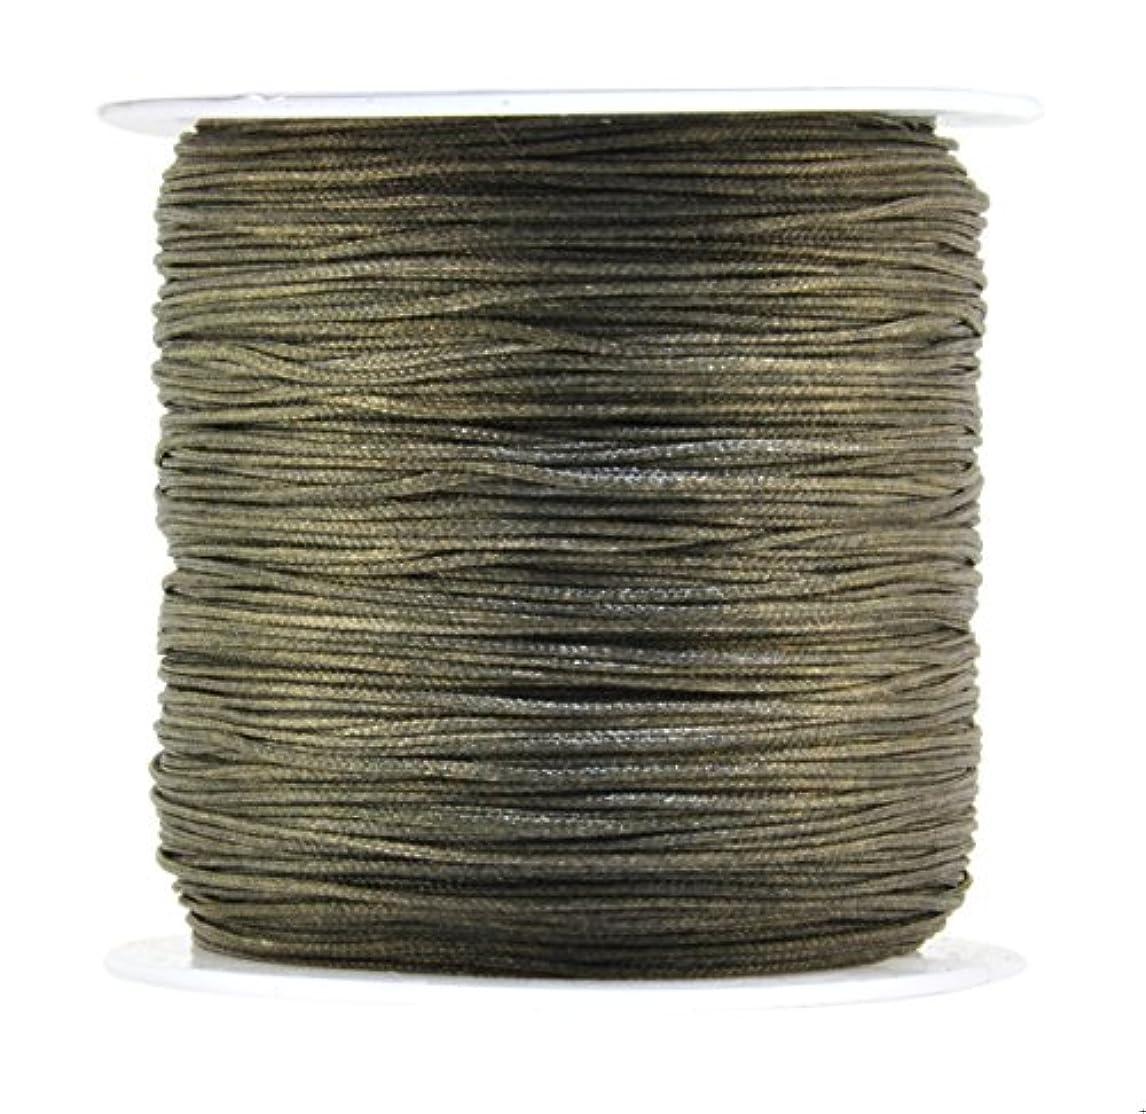 Mandala Crafts 0.8mm 100M Satin Nylon Chinese Knot Rattail Macramé Beading Knotting Sewing Cord (Brown) zarqc49671079933